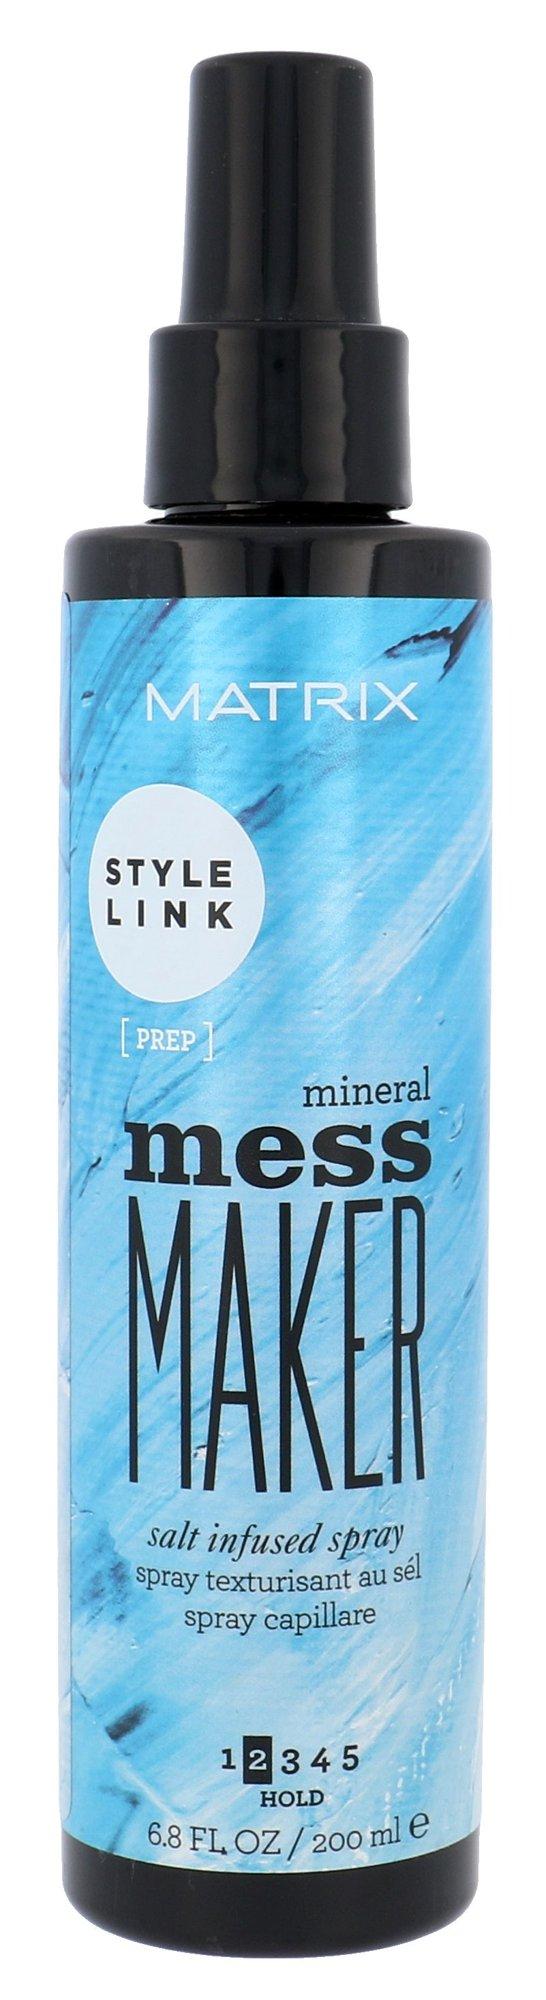 Matrix Style Link Cosmetic 200ml